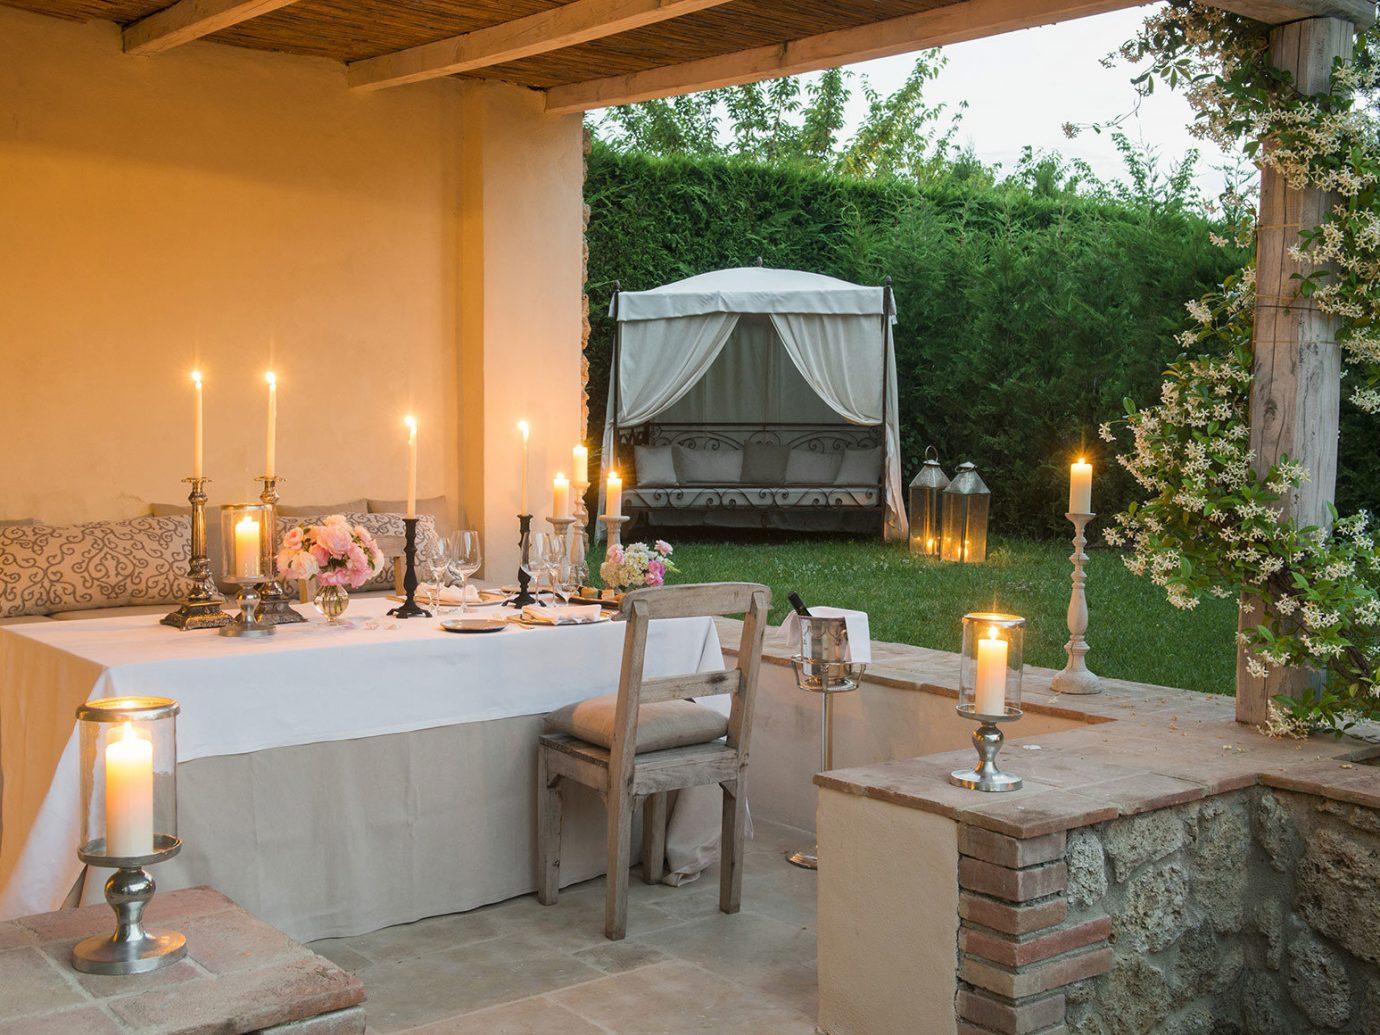 Hotels Luxury Travel Patio outdoor structure backyard real estate interior design restaurant